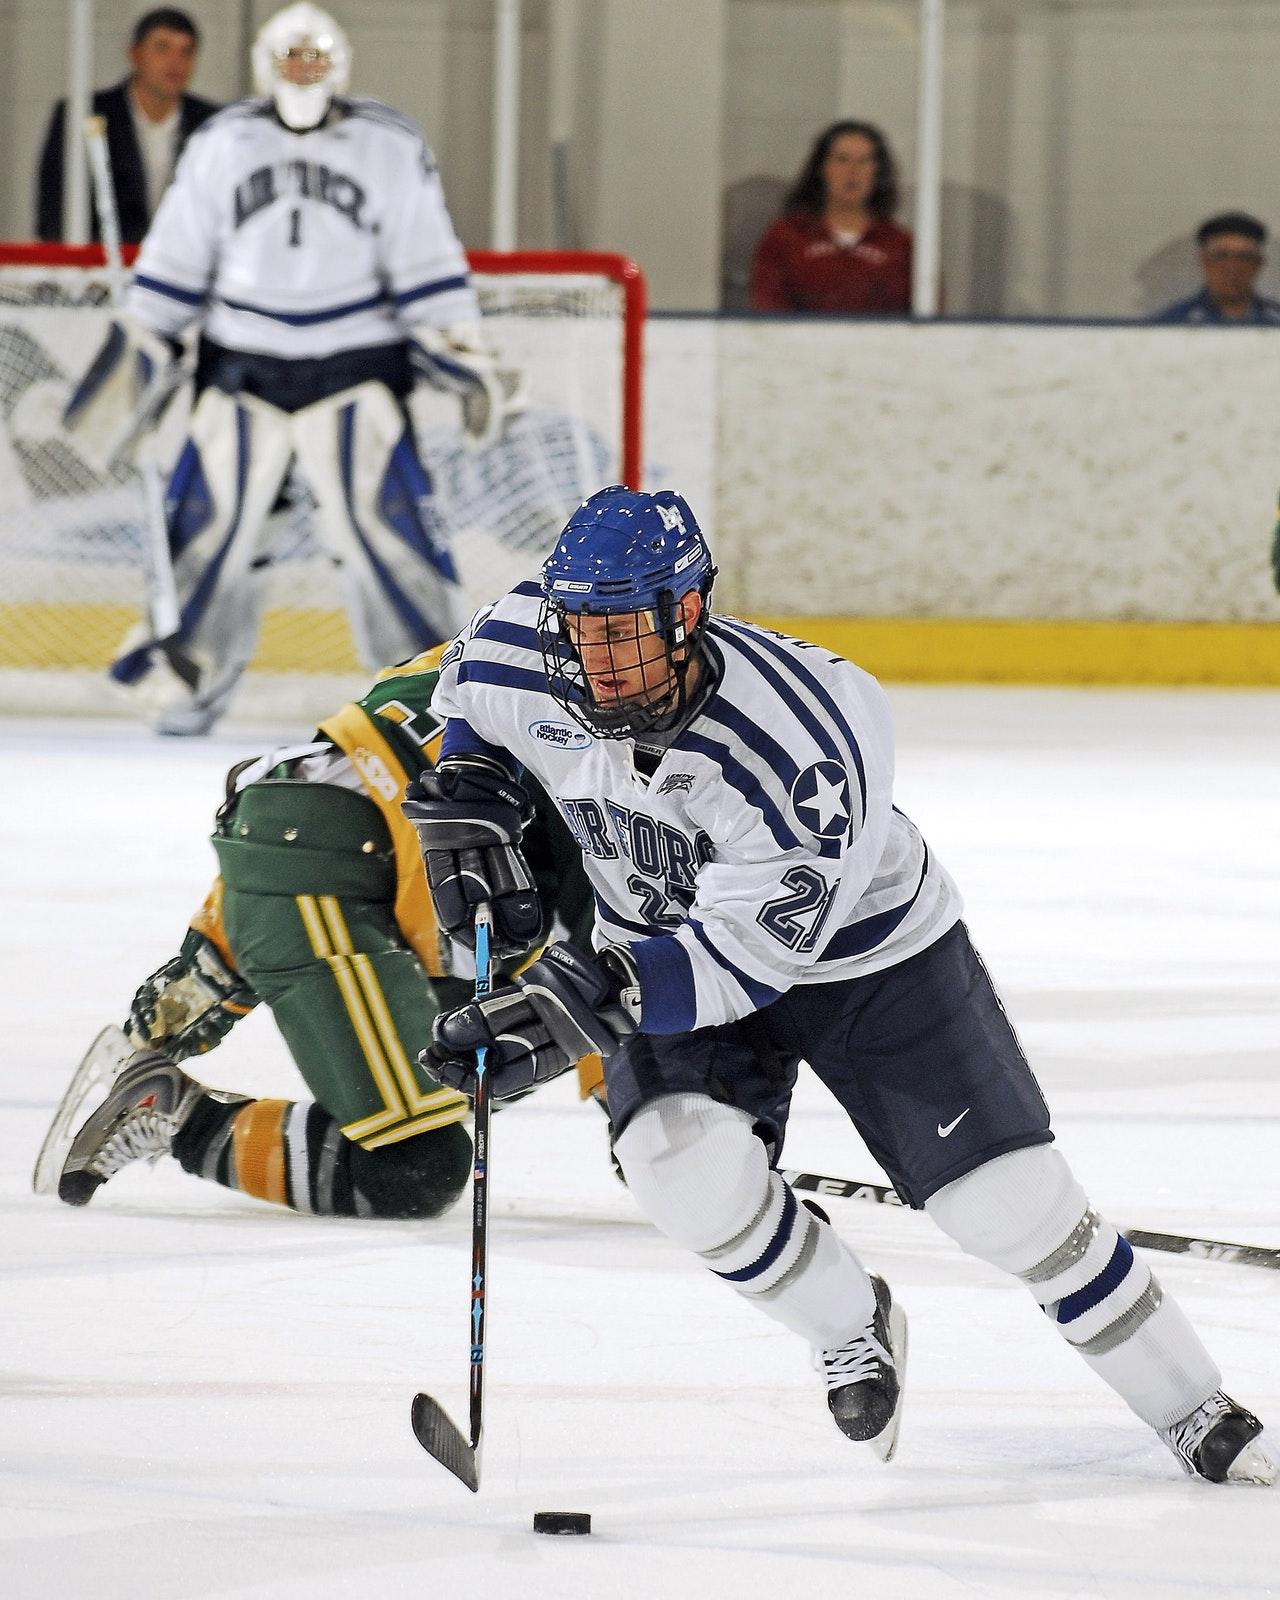 Ice Hockey Game in progress